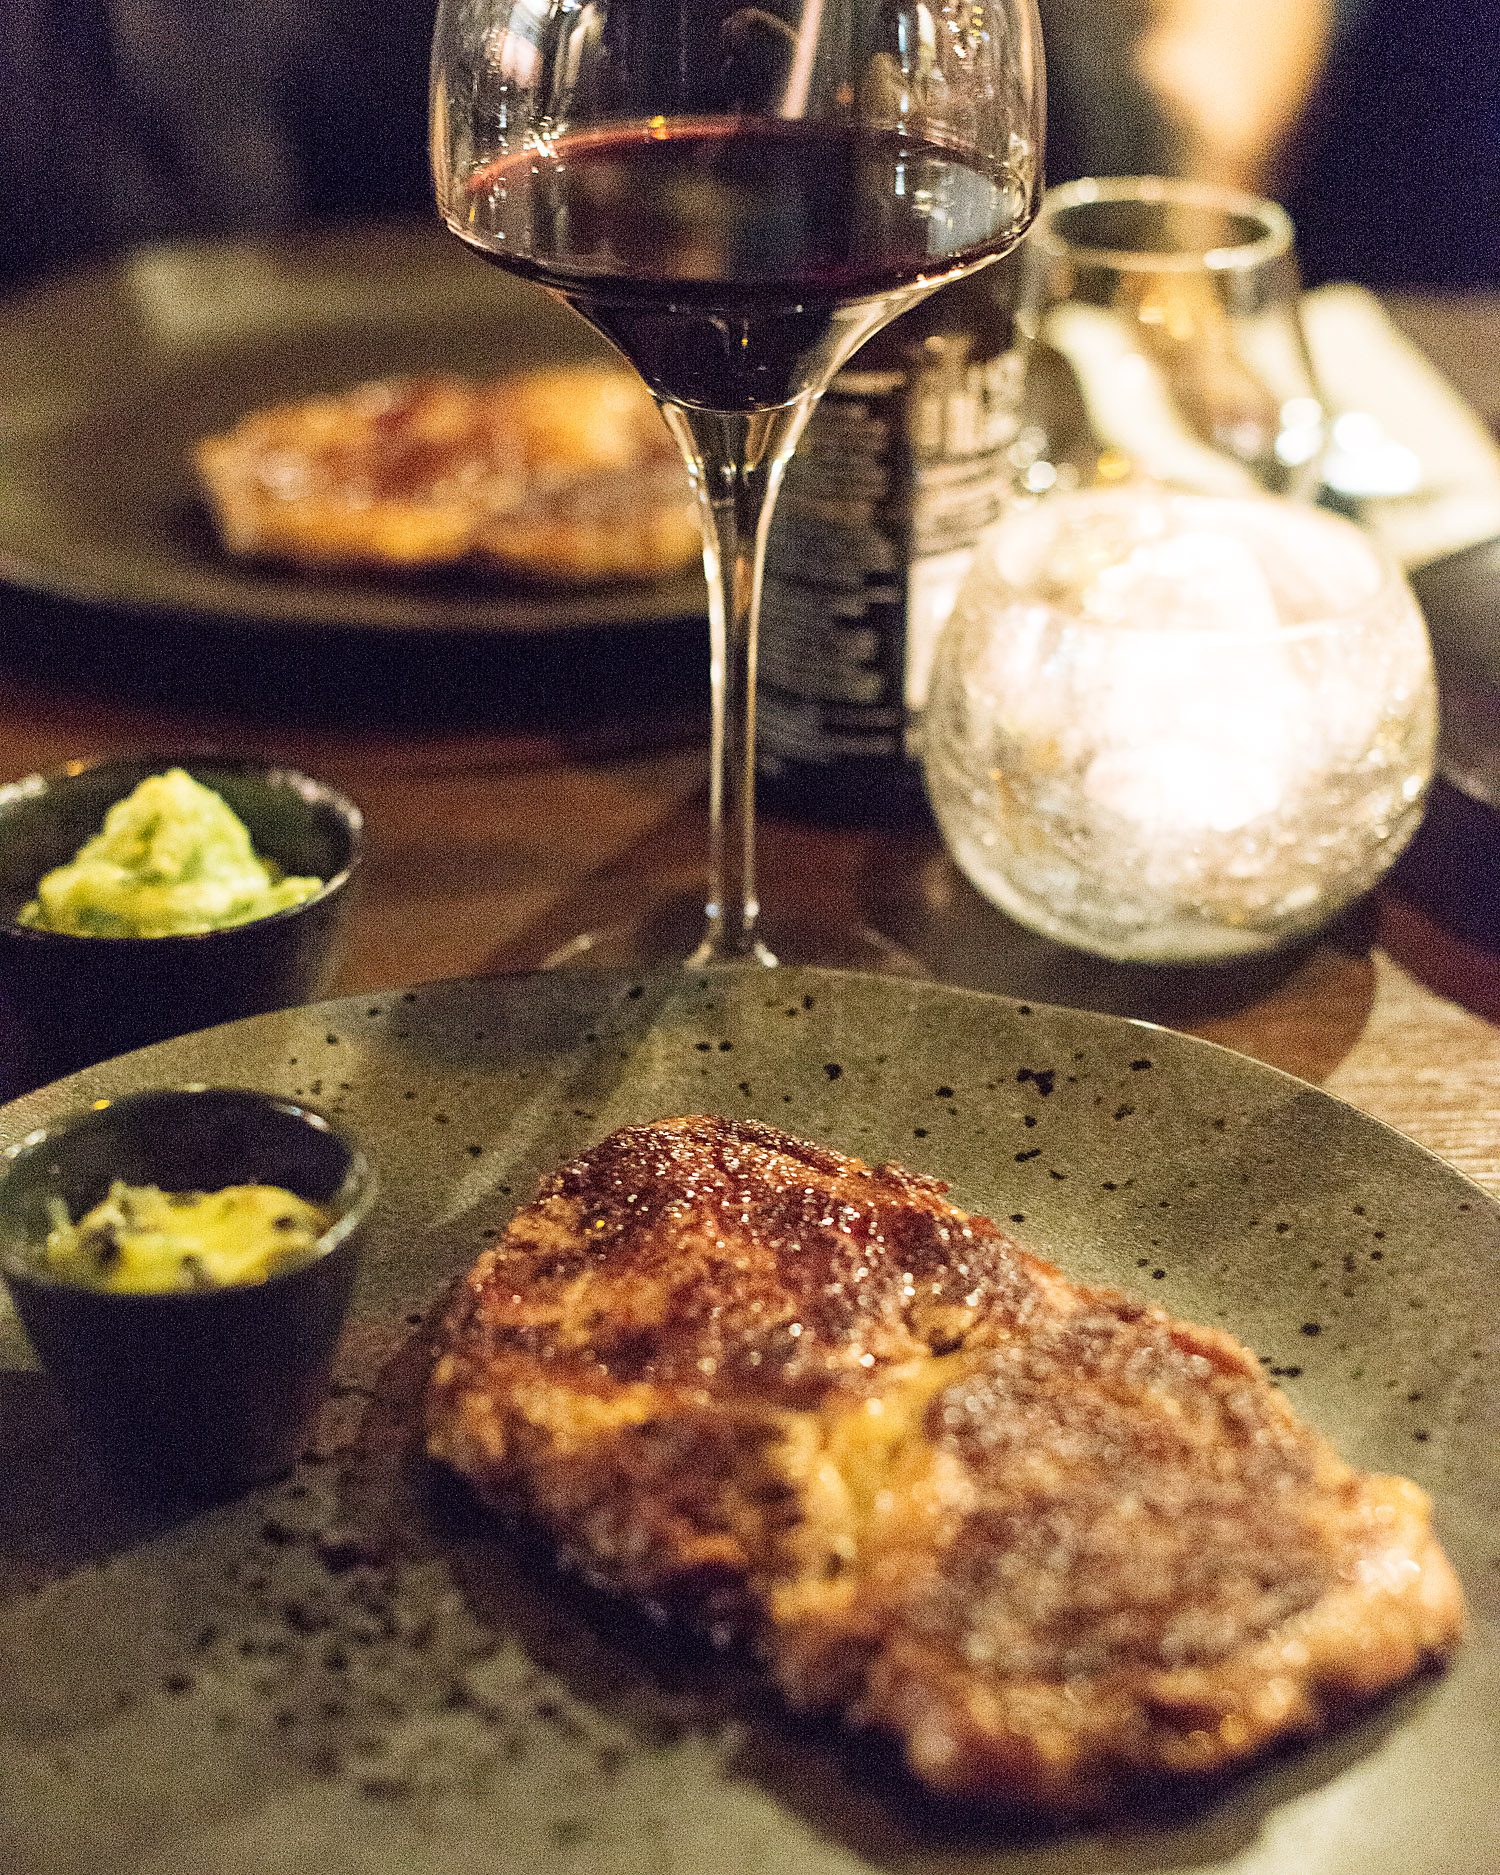 Rib eye steak with truffle butter